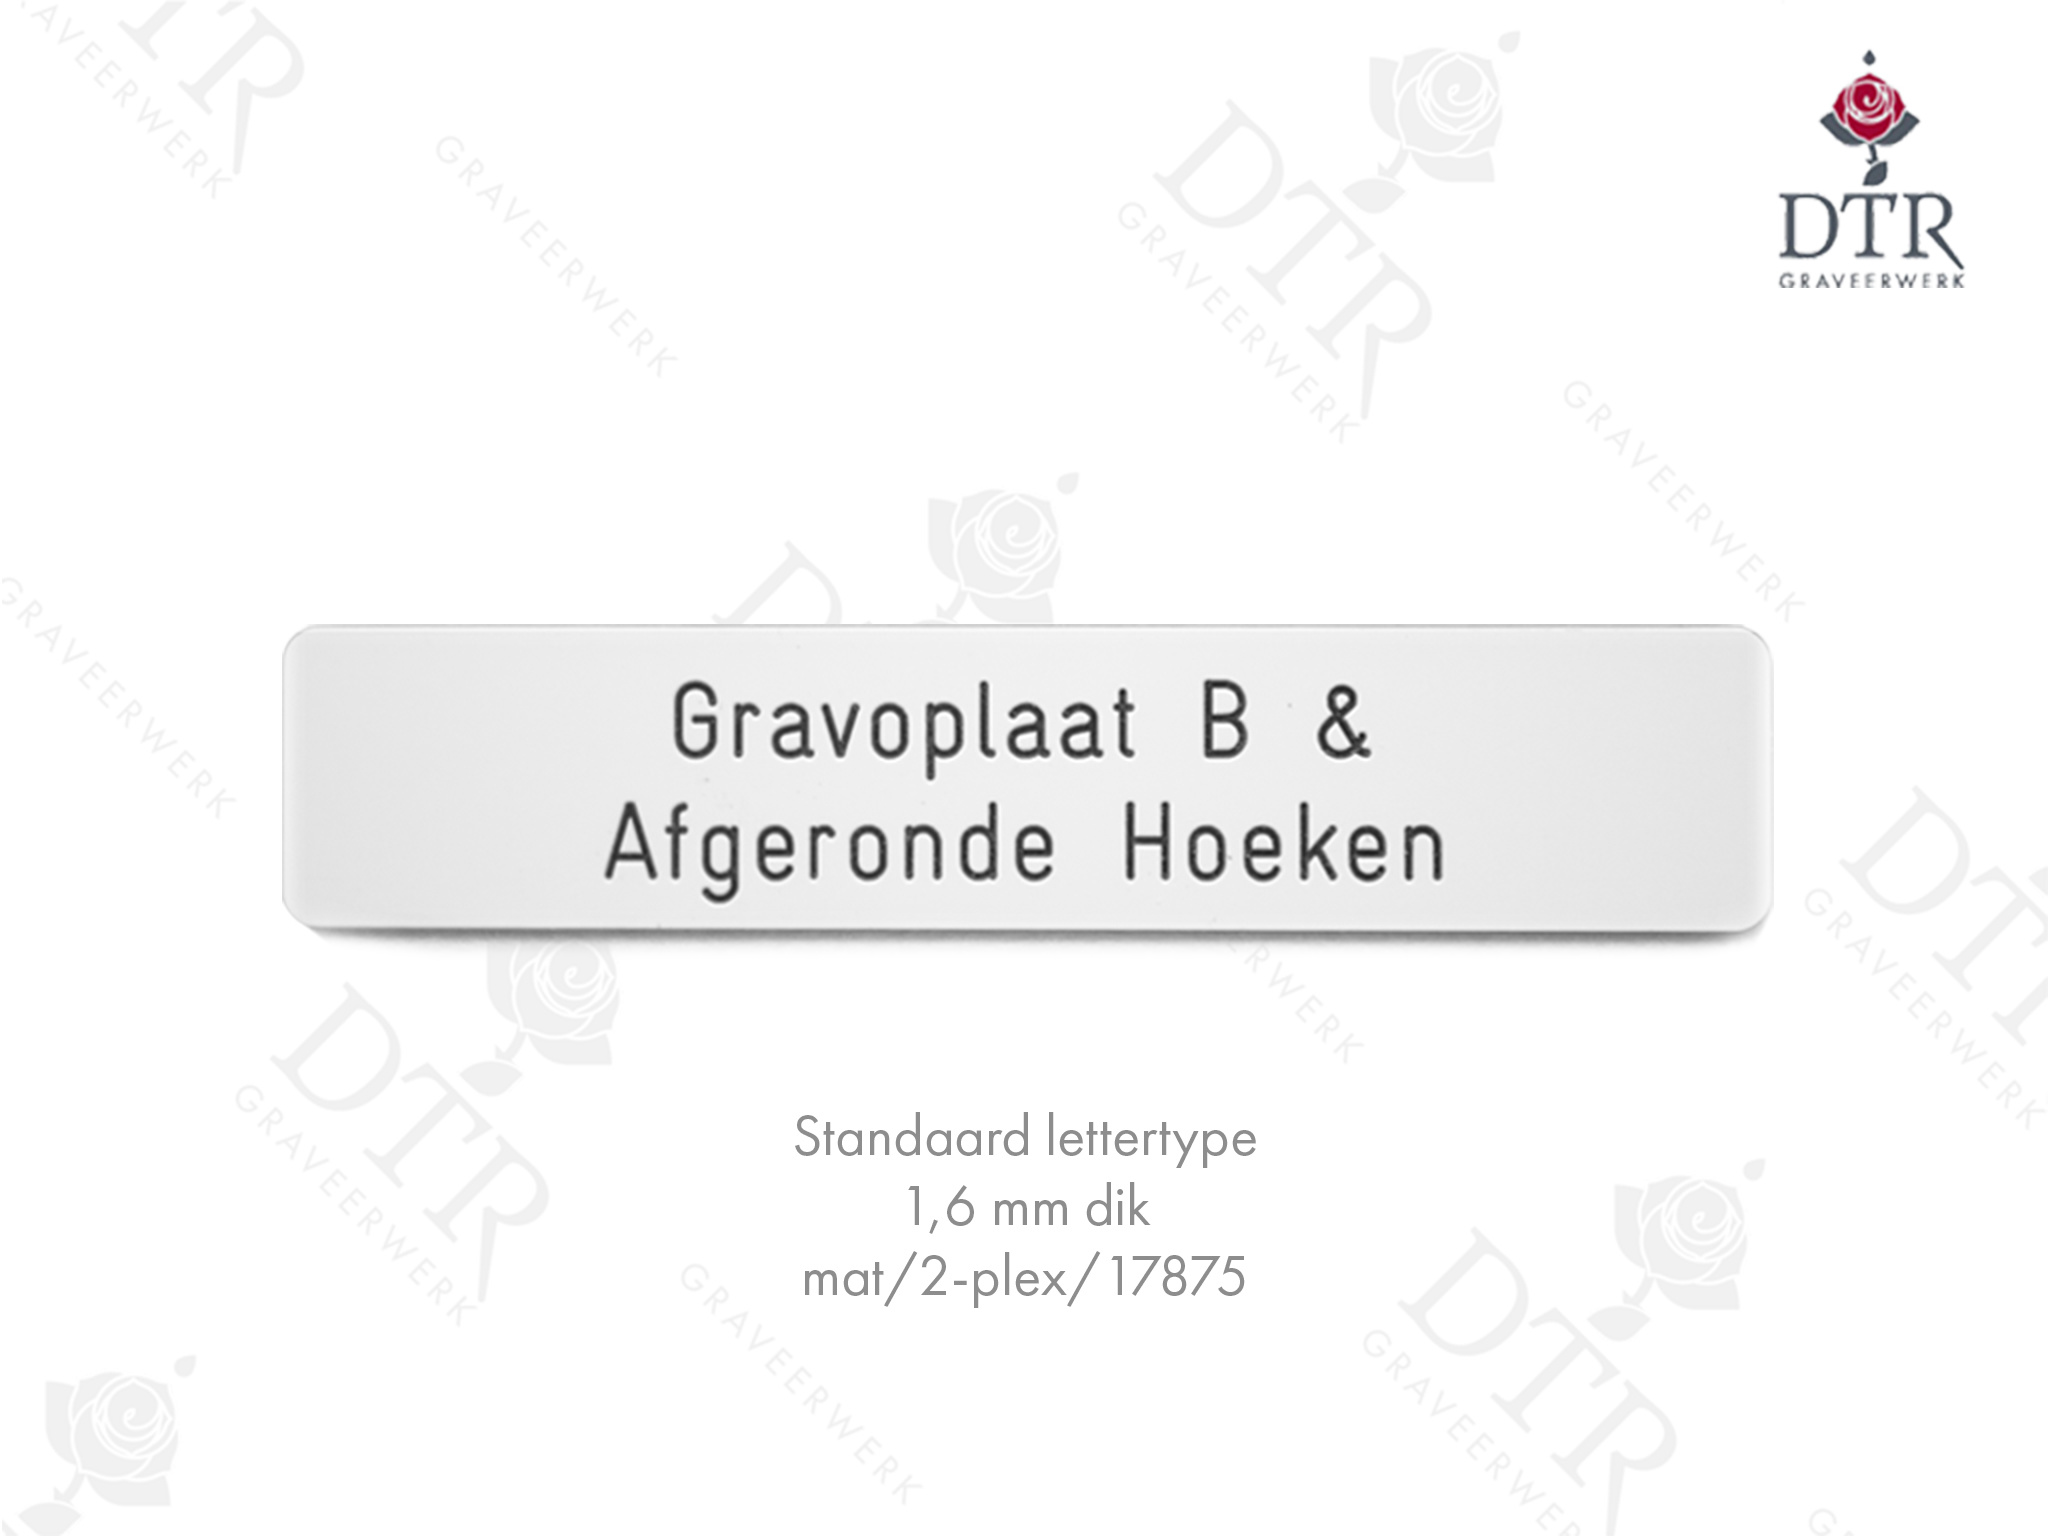 Kwakkenbergweg (Vijverh) 2/195